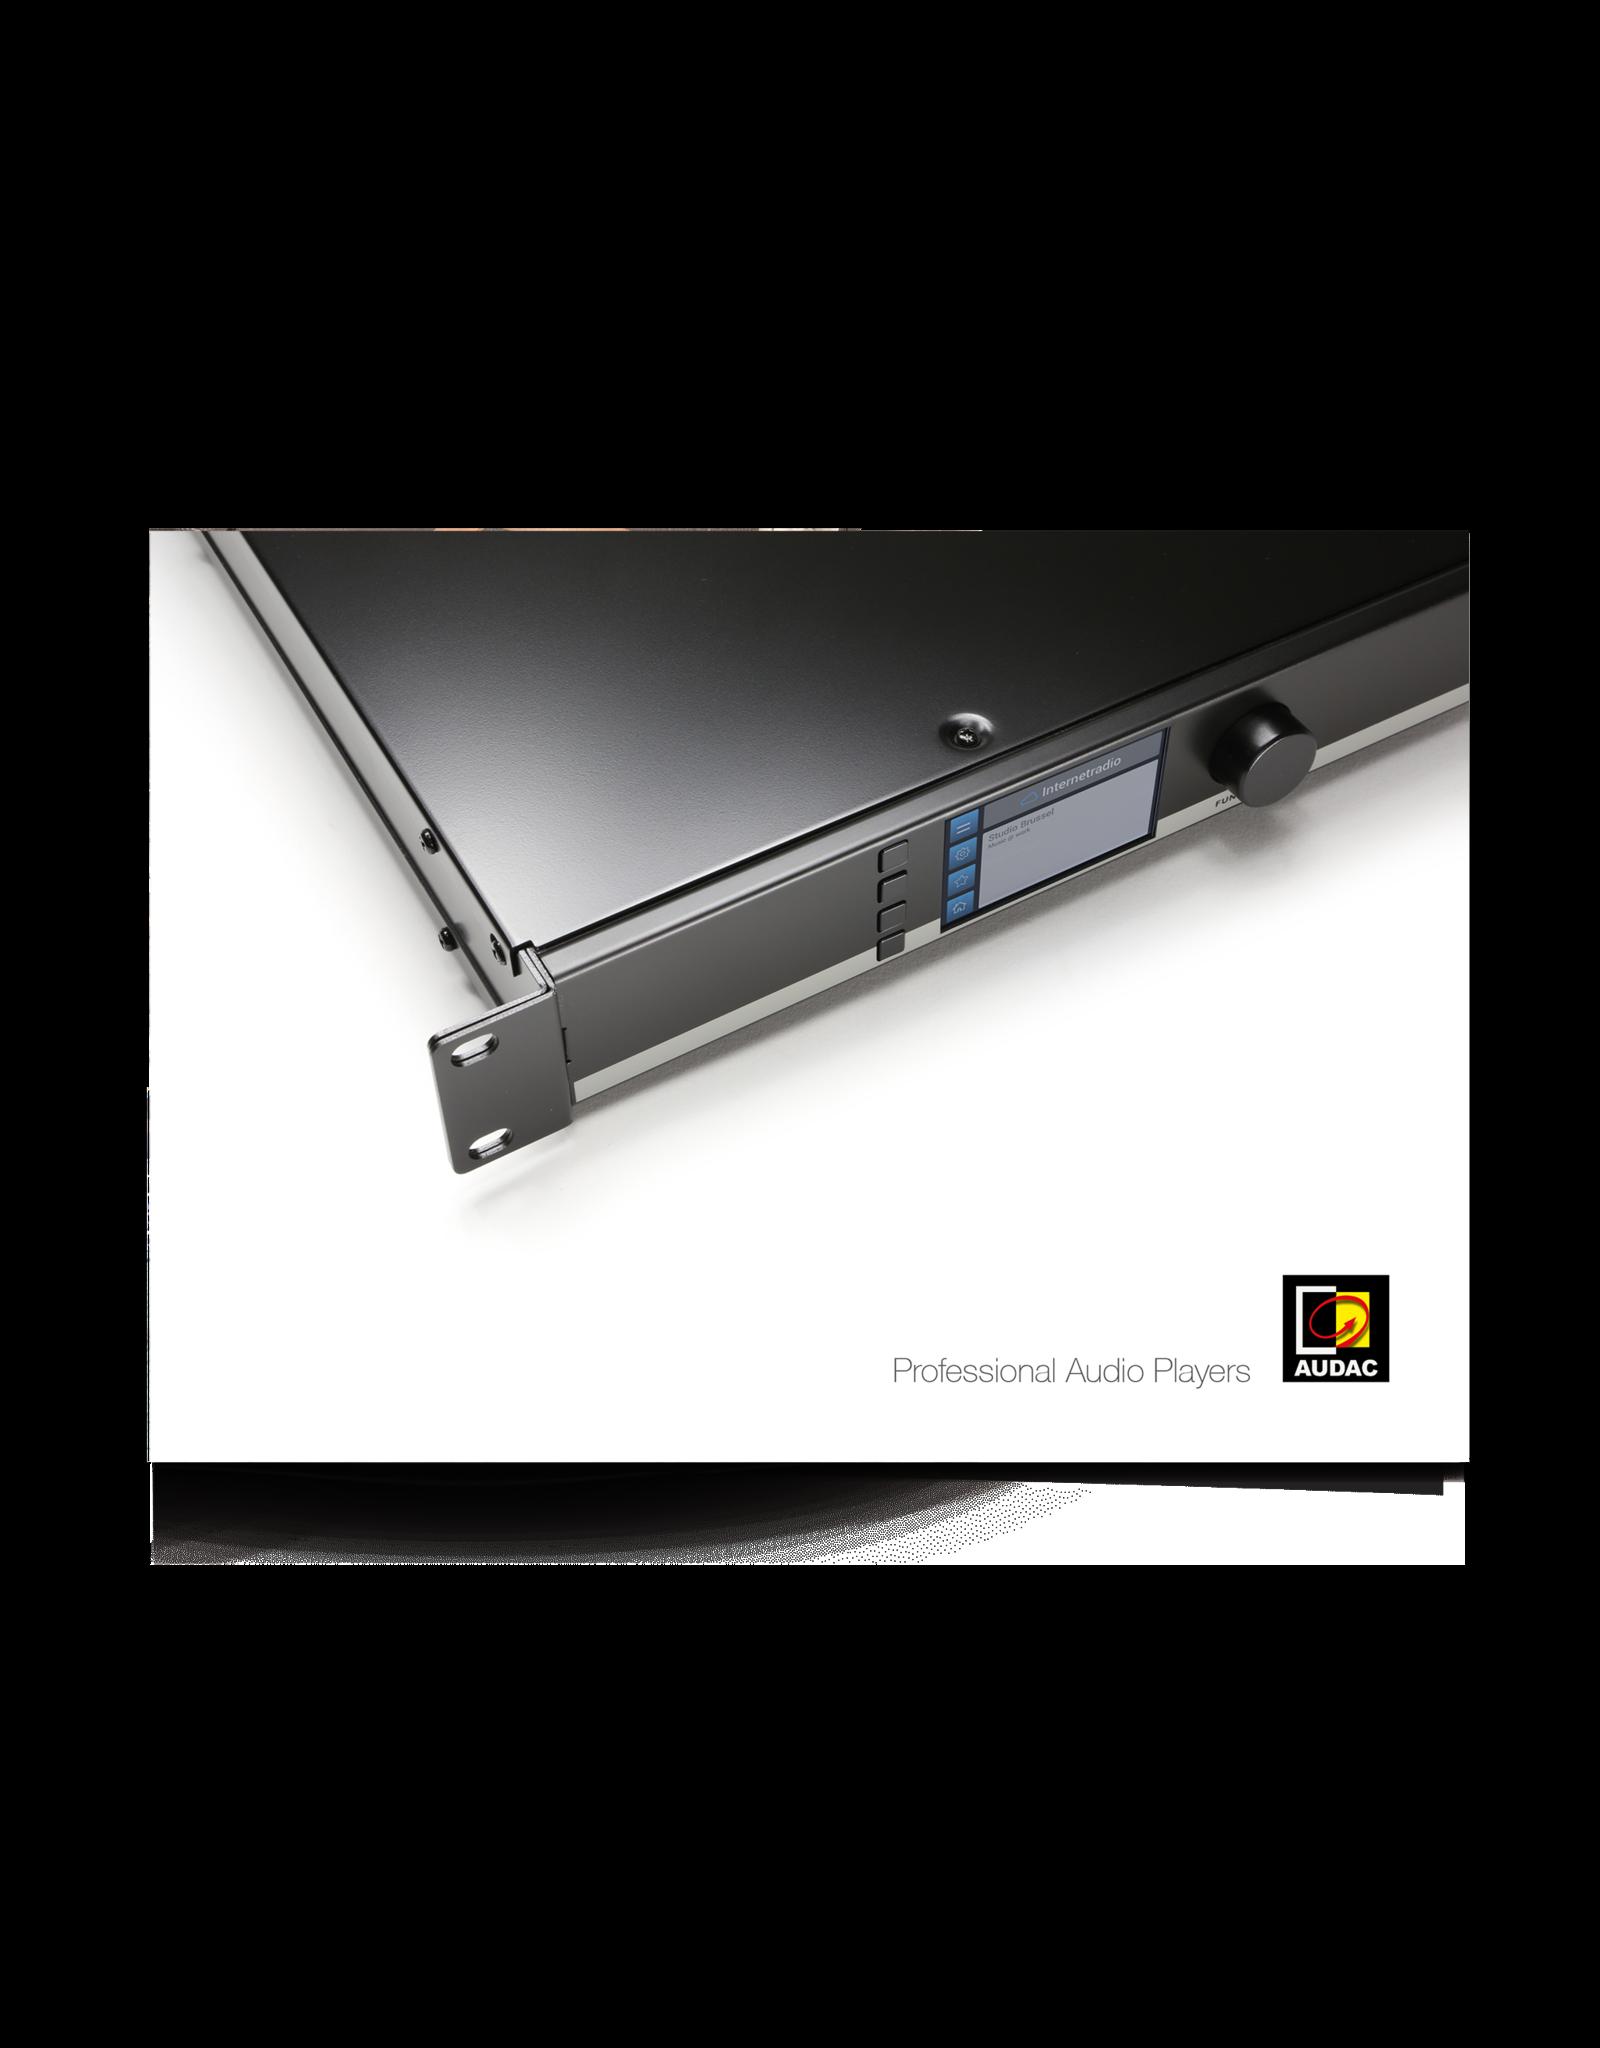 Audac Professional Audio Players catalogue V3.0